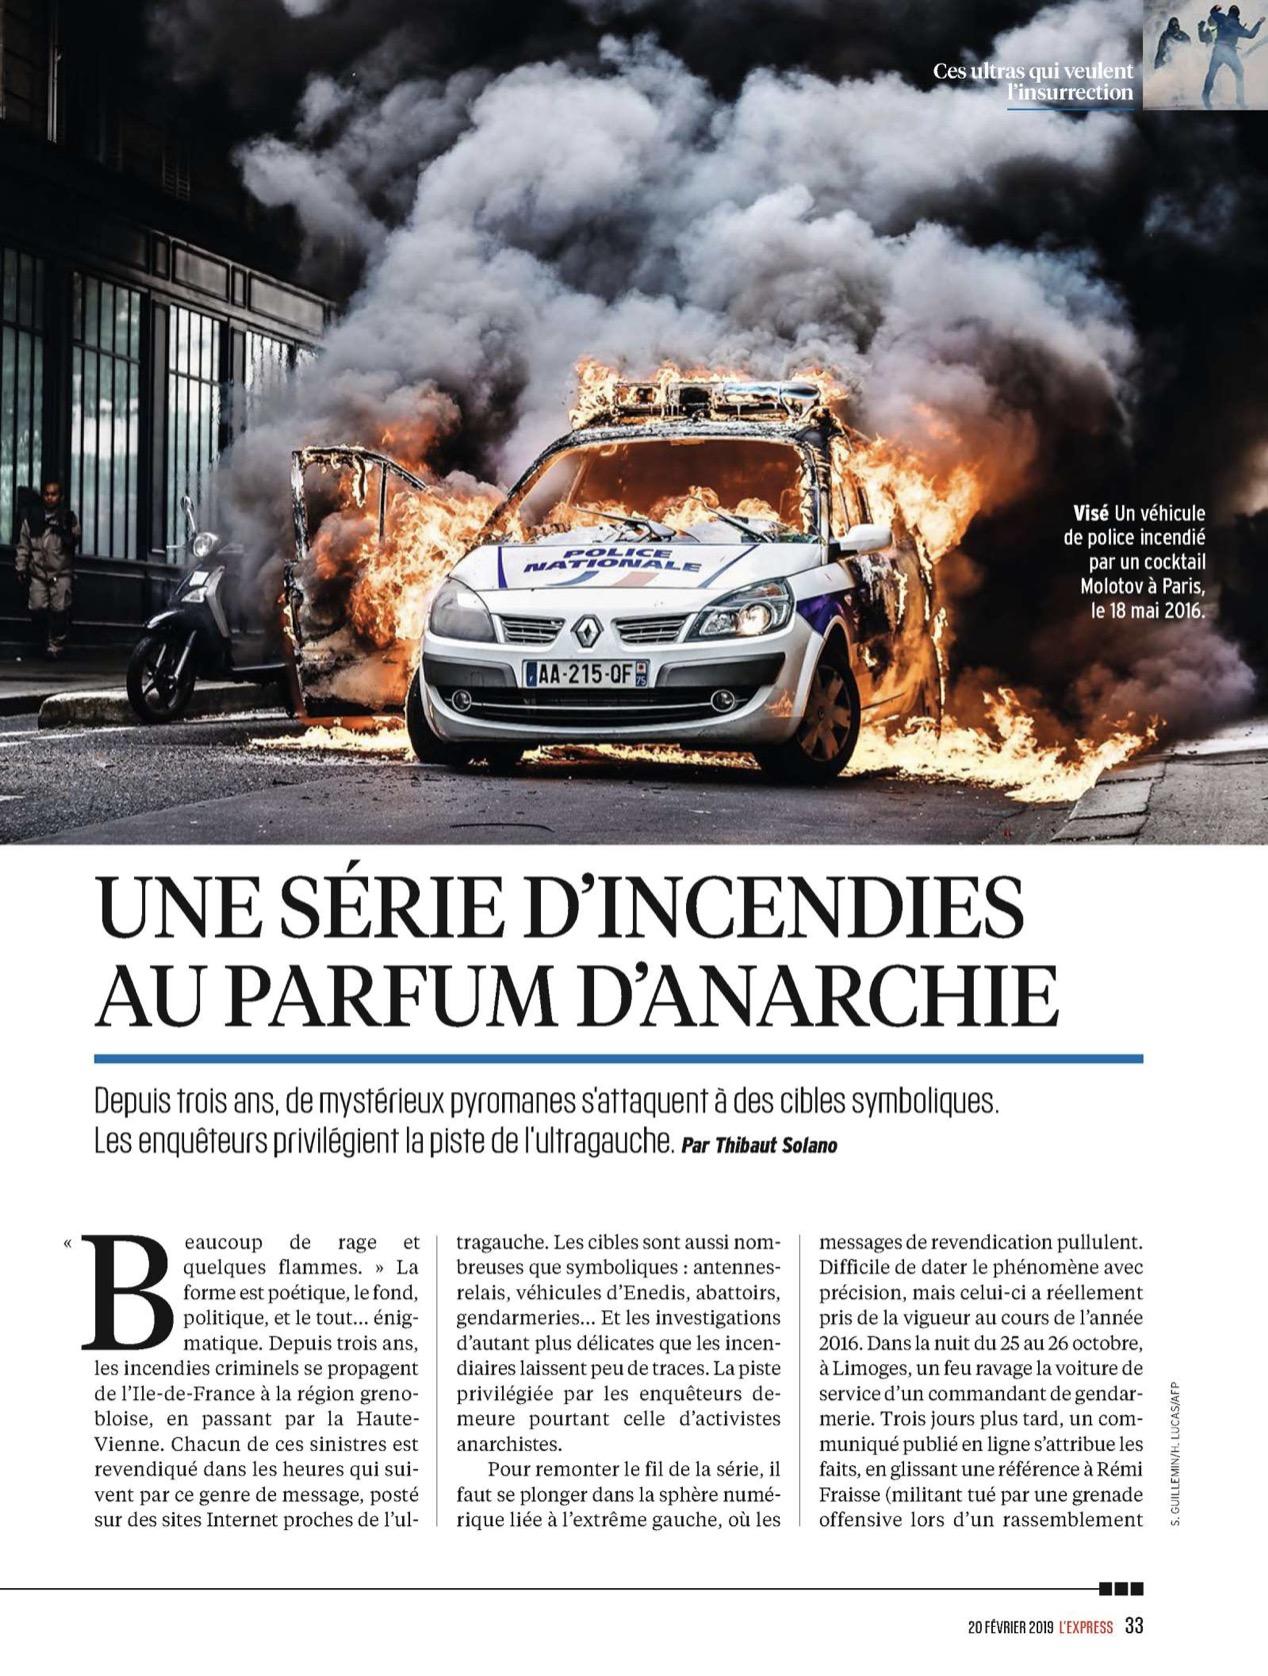 PUBLI - Express -  voiture police en feu.jpg